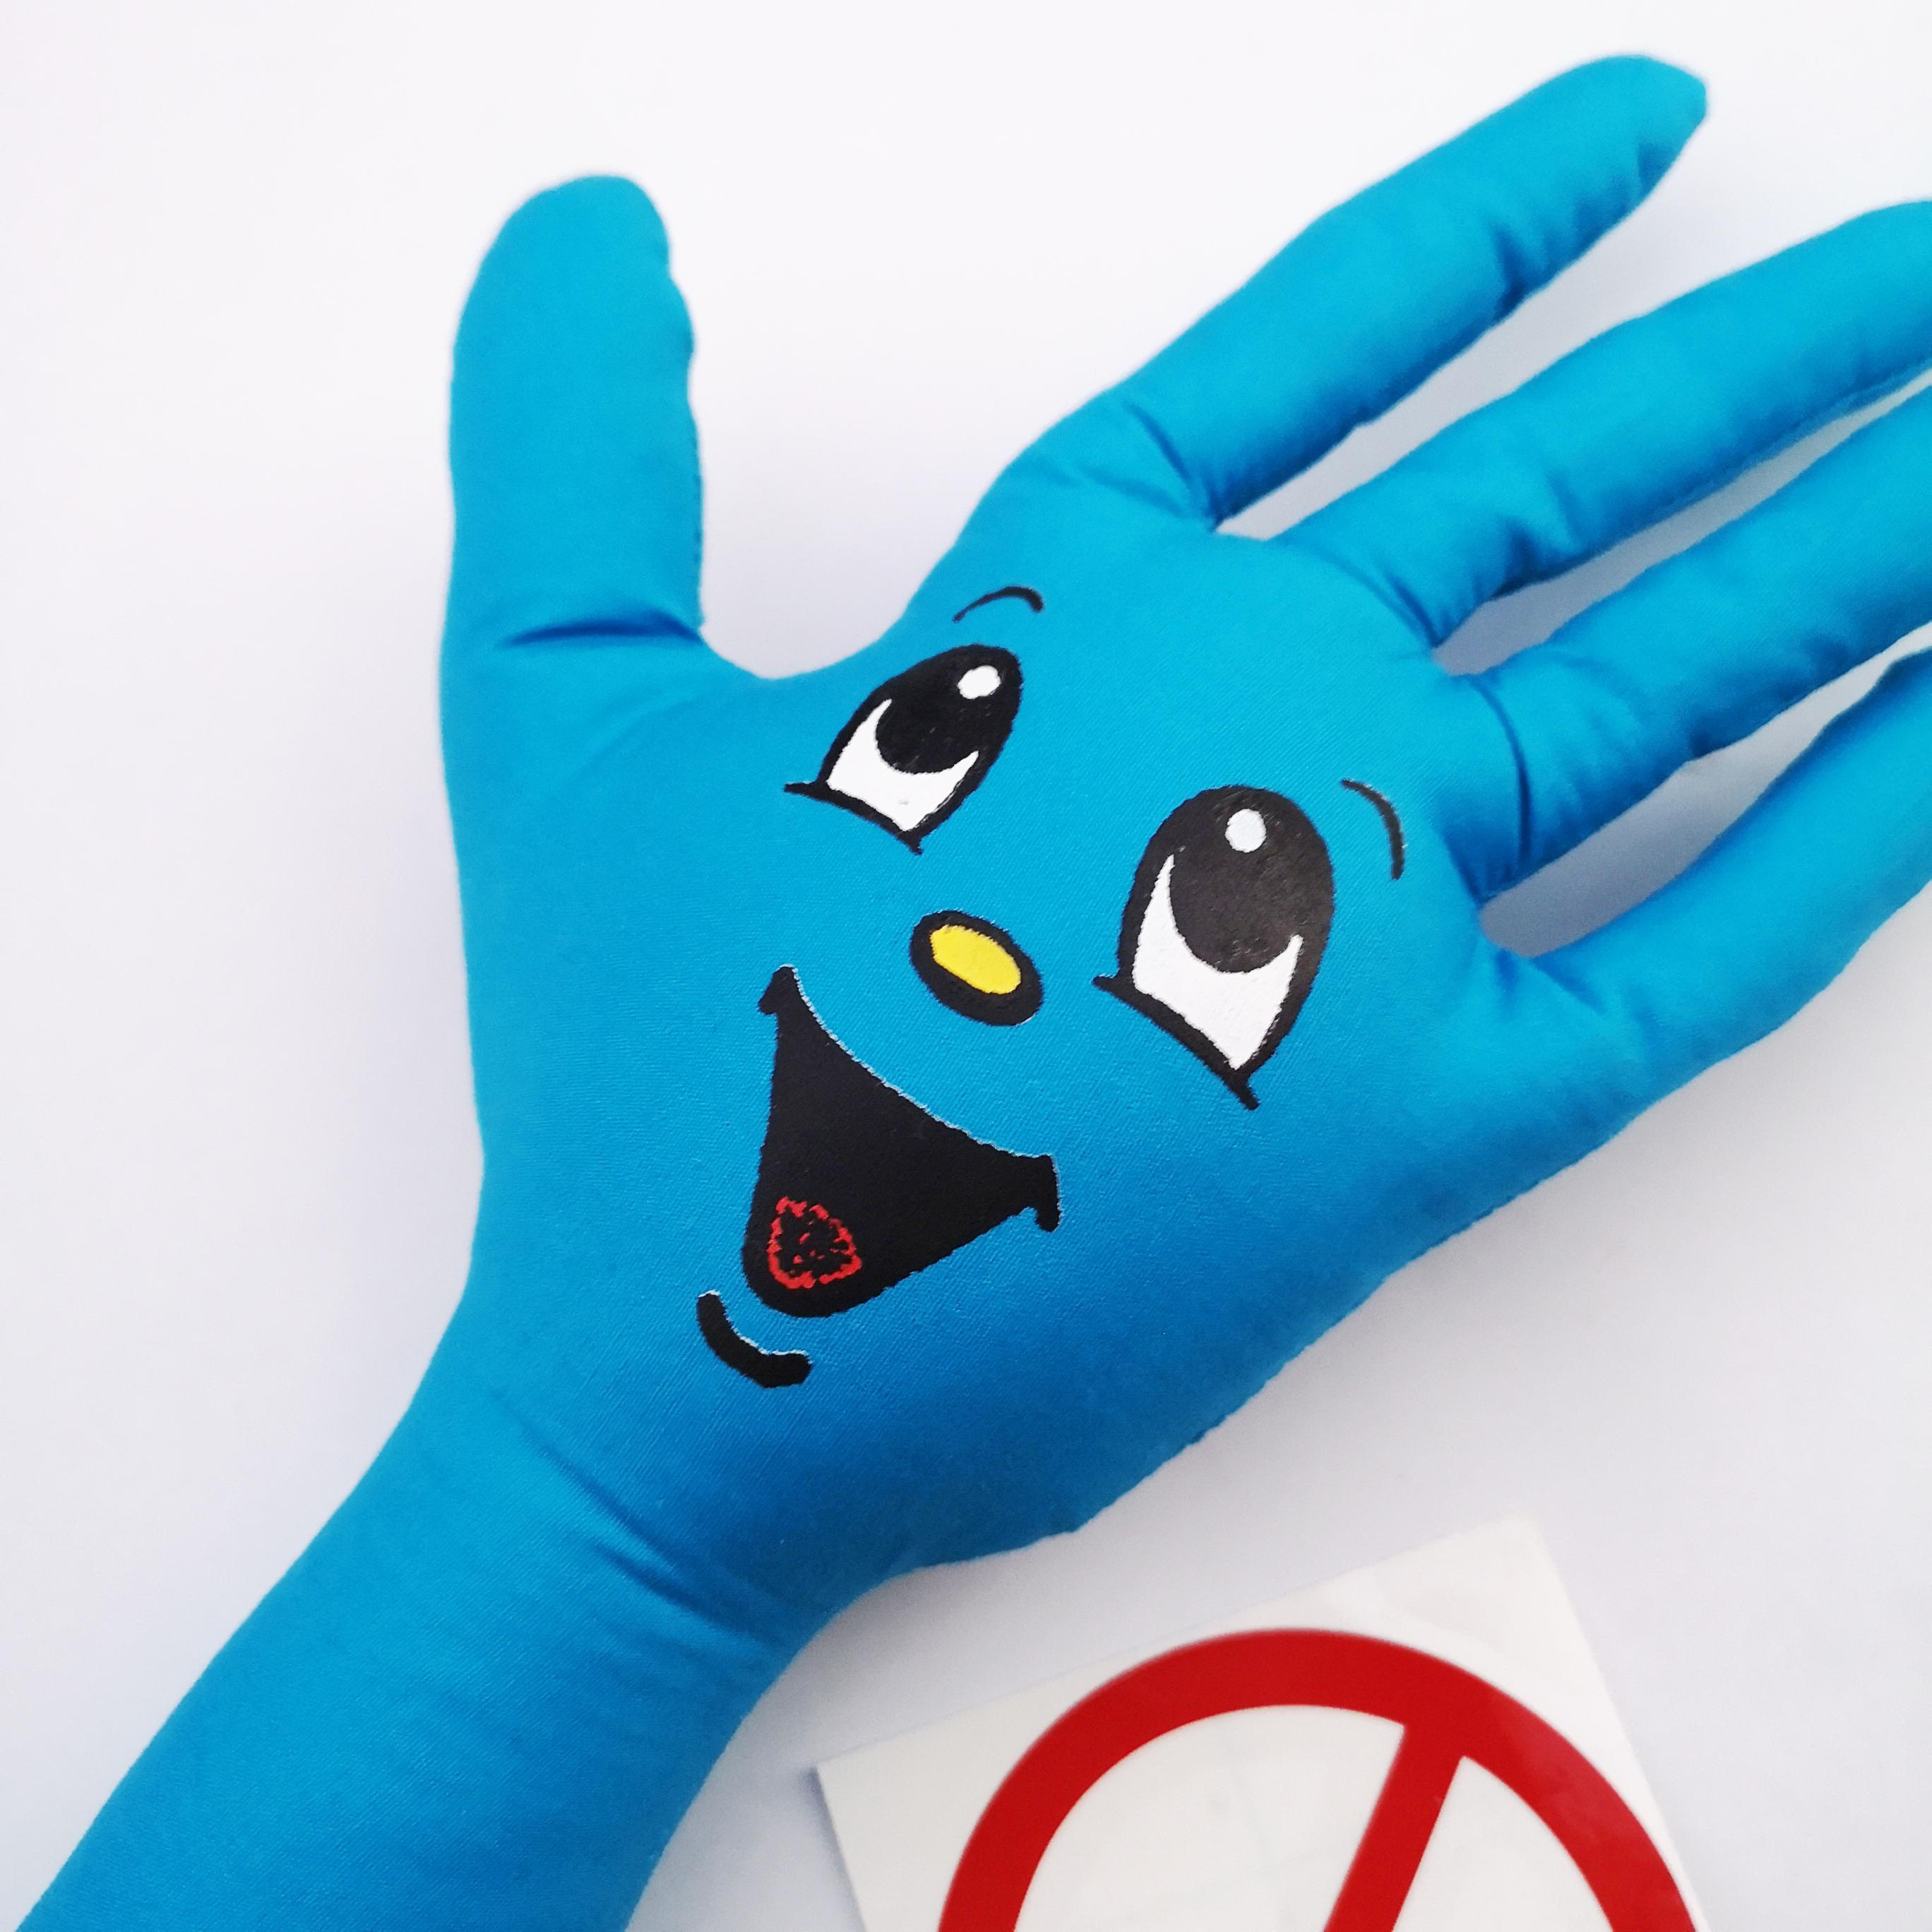 ||||| SCREAMING HAND PLUSH TOY BLUE, YELLOW